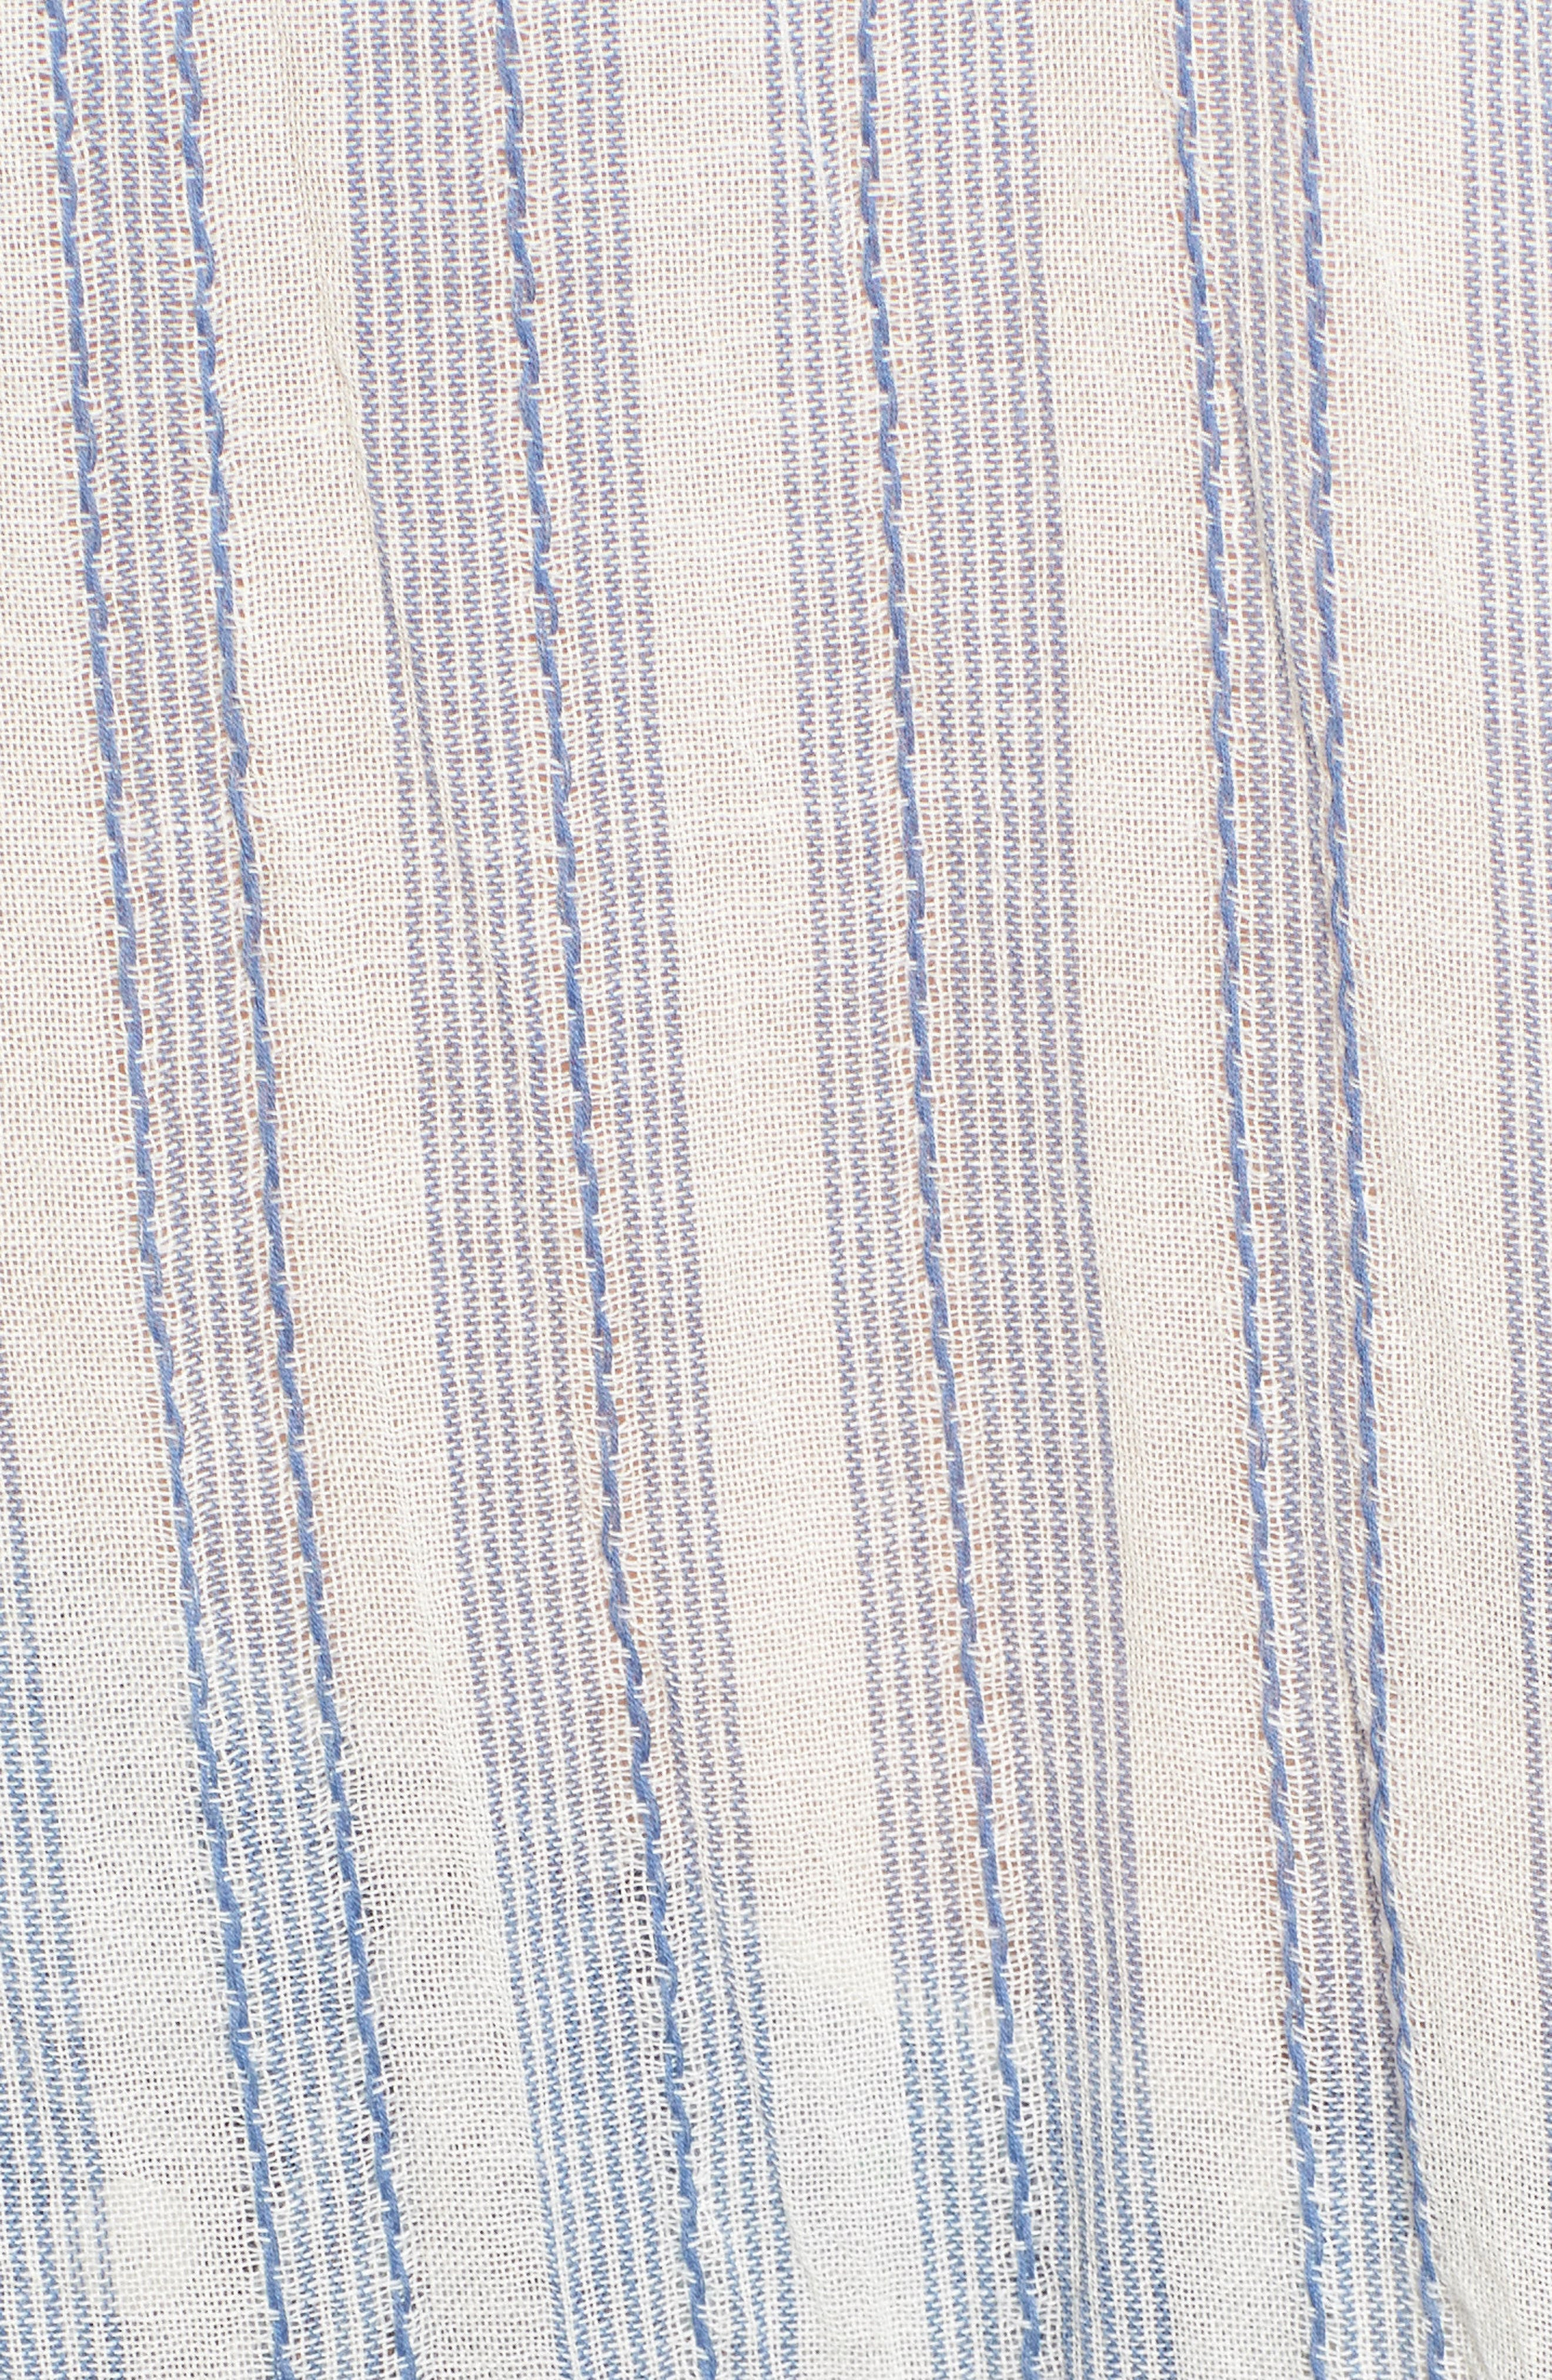 Stripe Cotton Split Neck Top,                             Alternate thumbnail 5, color,                             Blue/ White Stripe